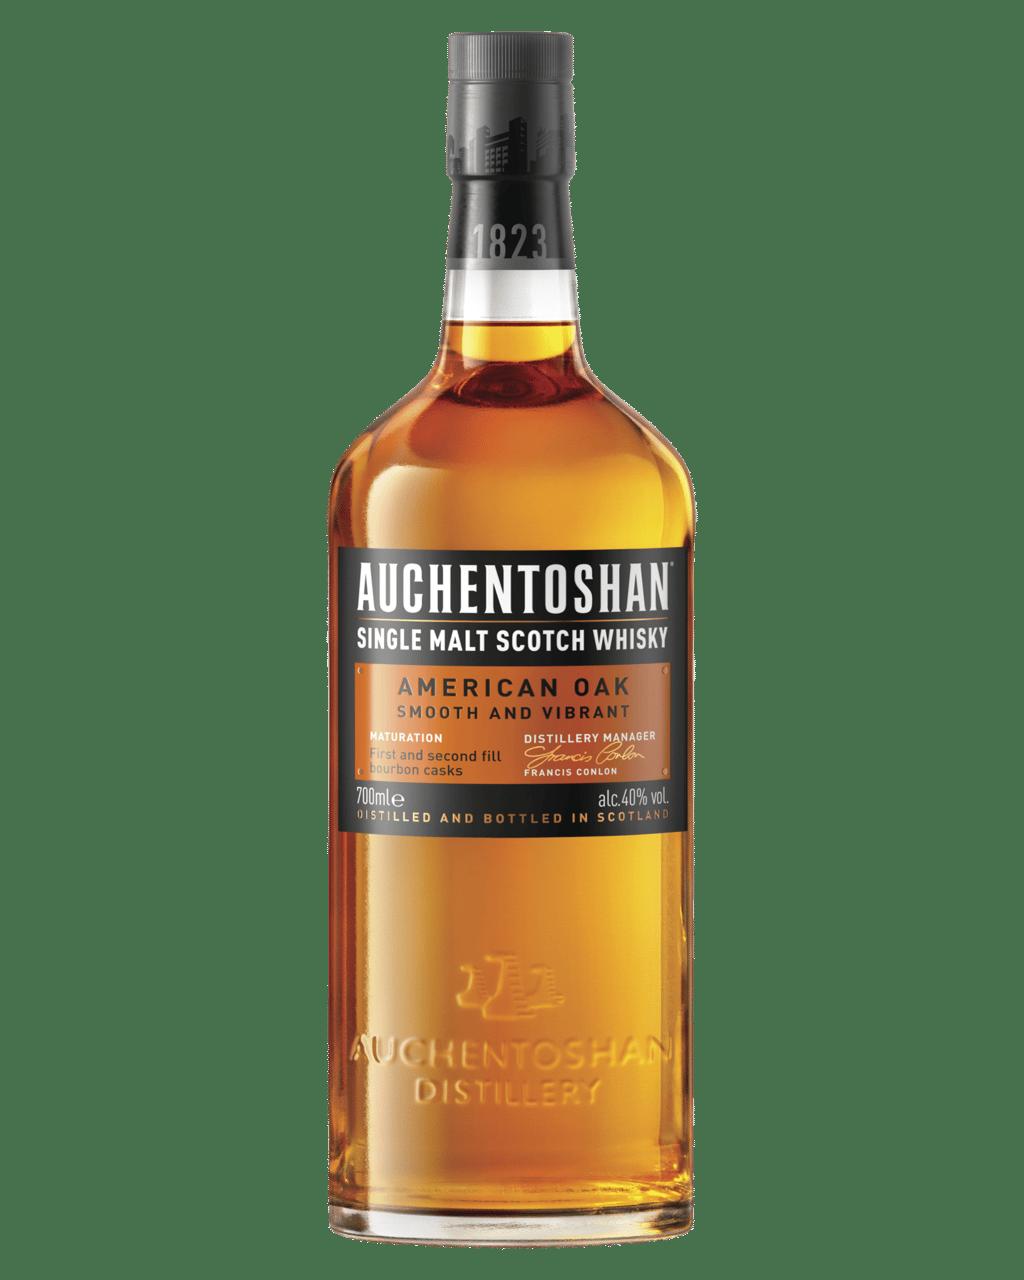 1c3980828168 Auchentoshan American Oak Scotch Whisky 700mL